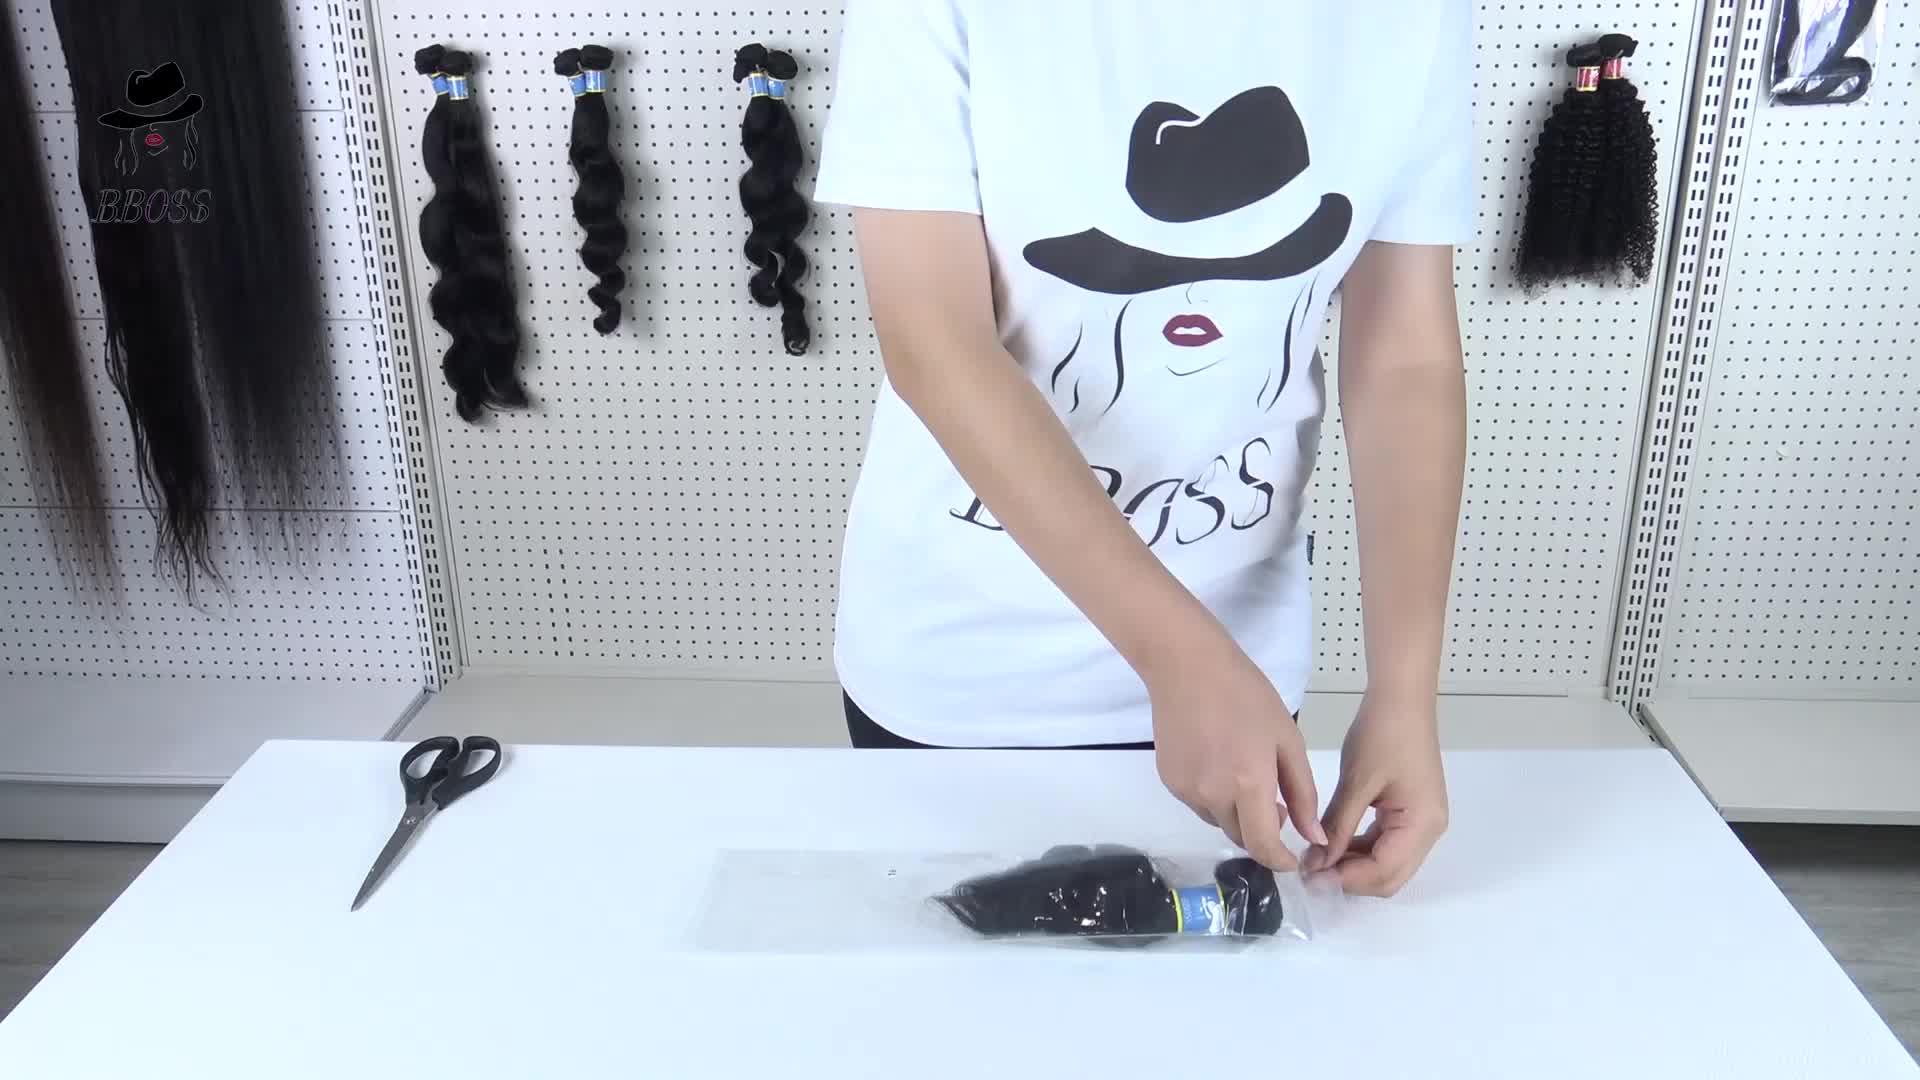 best human hair brazilian 22 inch, brazil remy hair extensions, human hair brazilian hair bulk